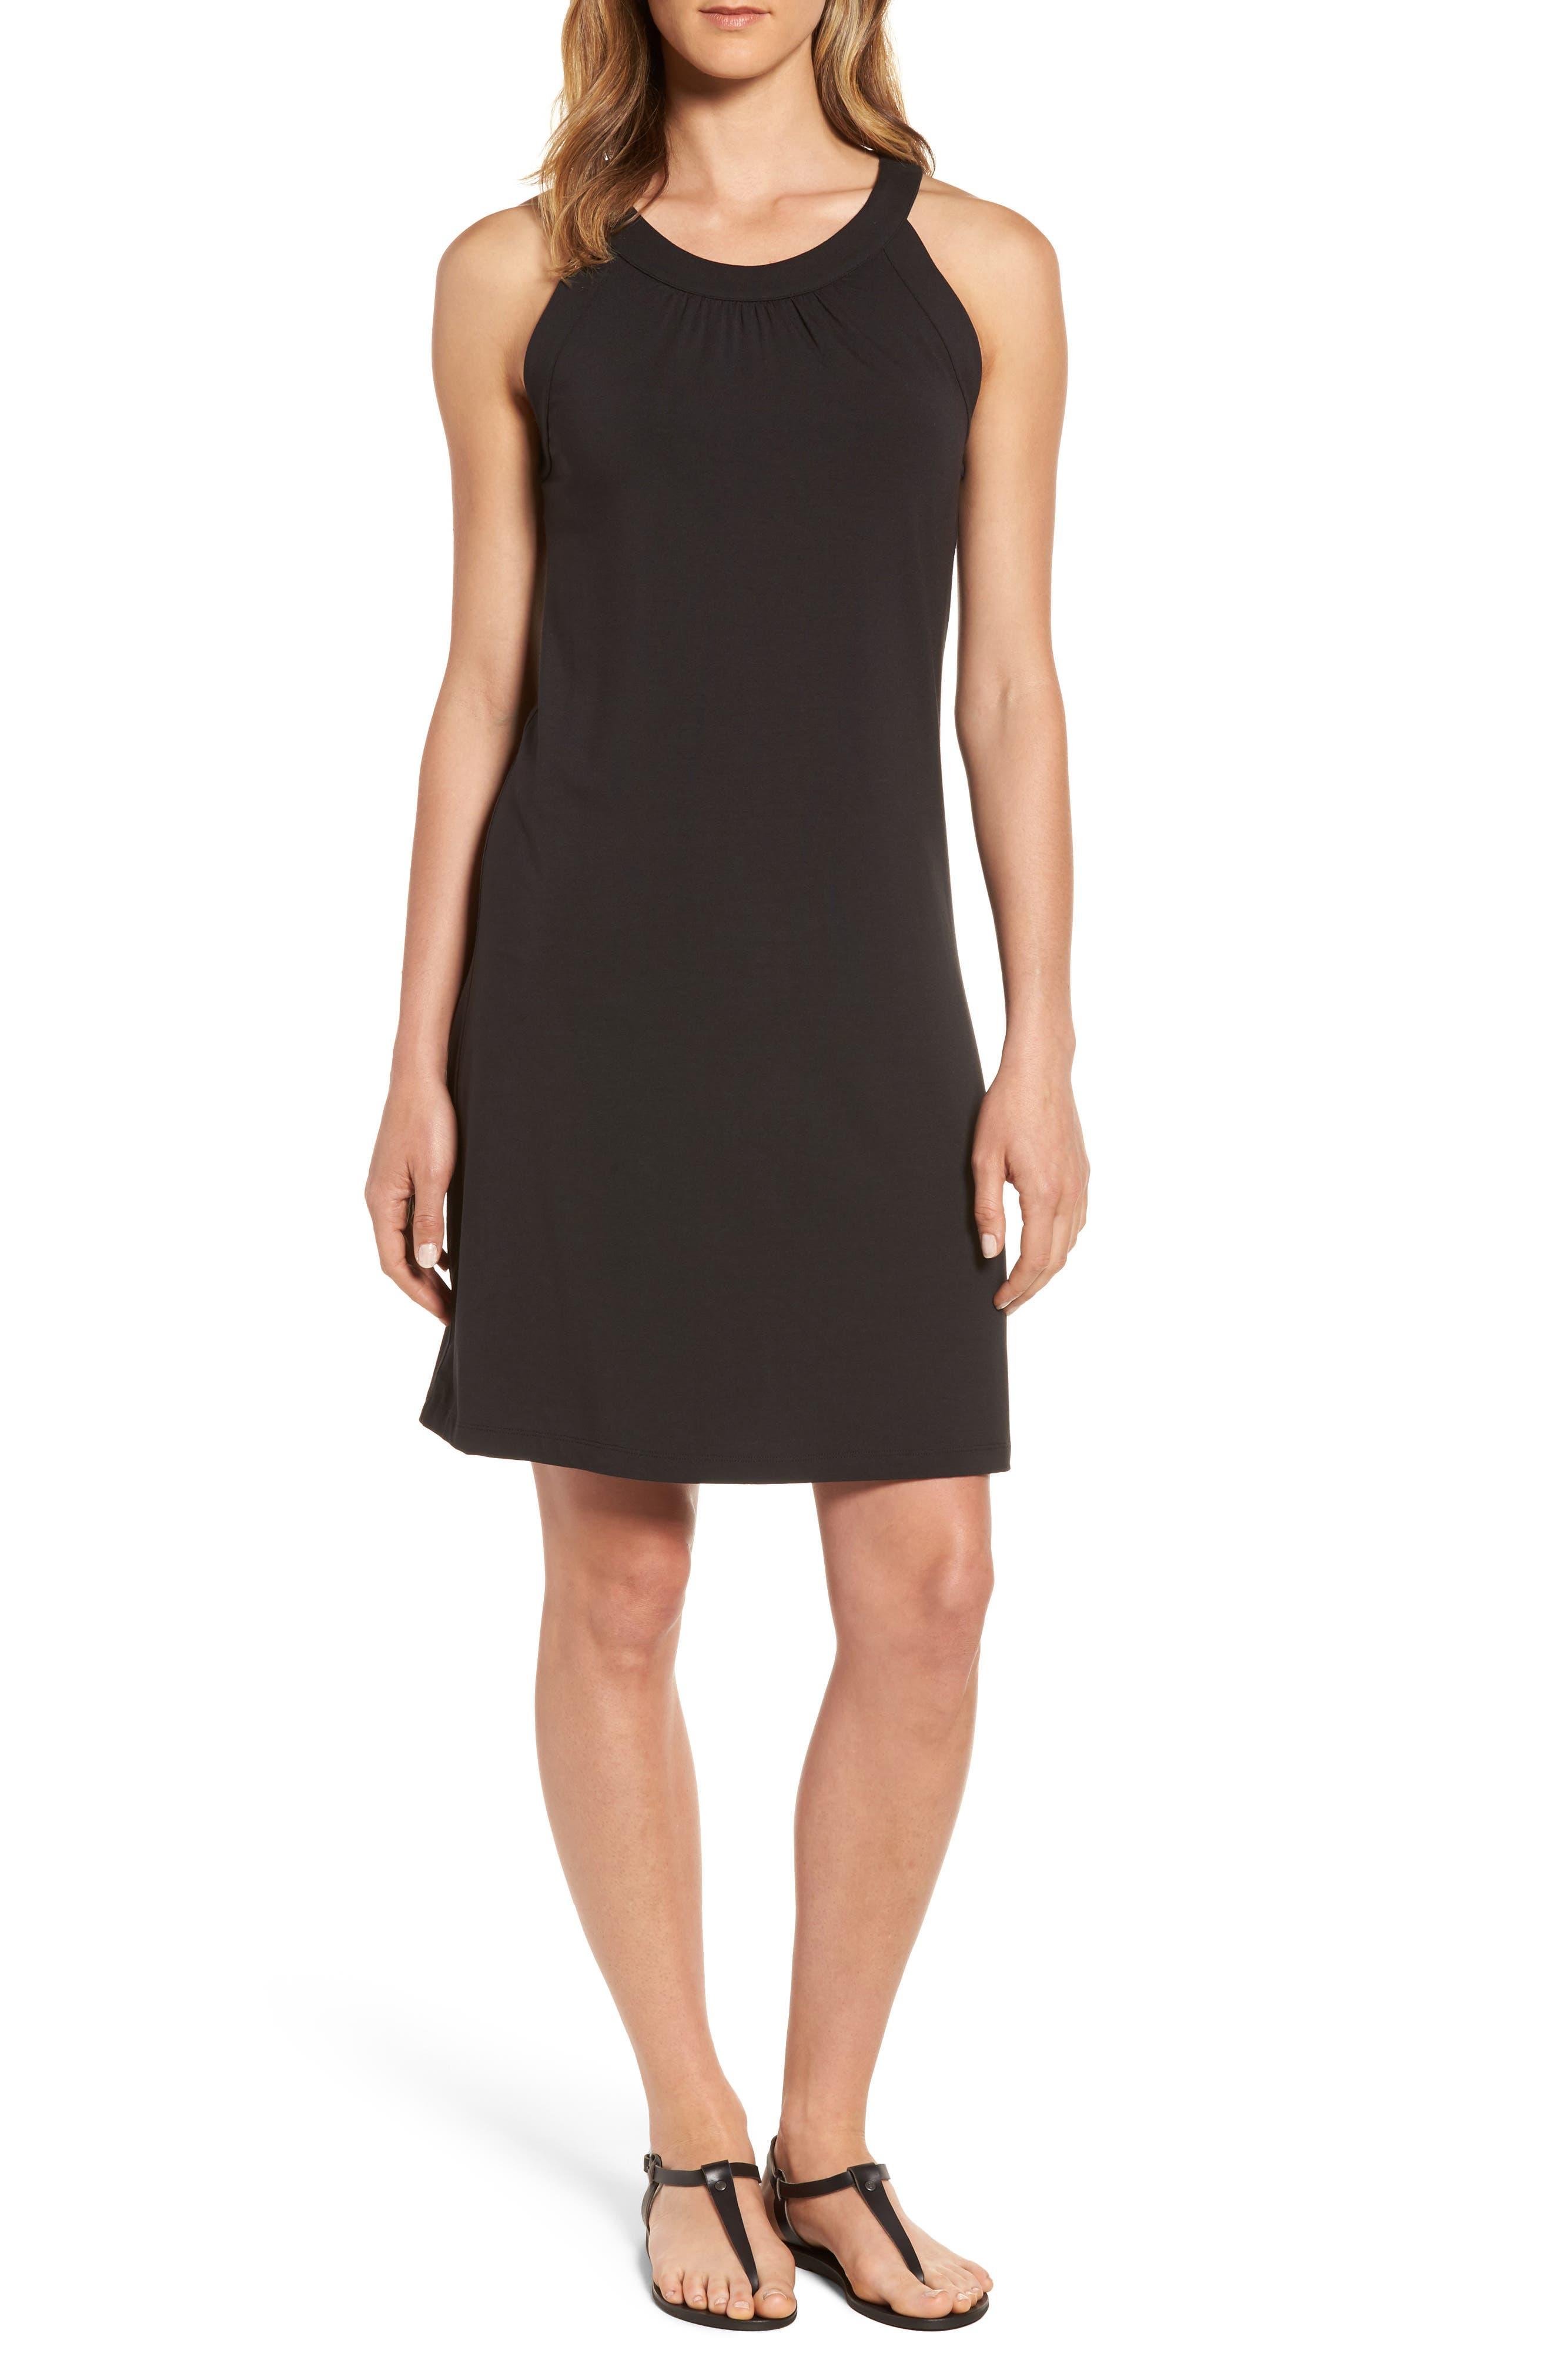 Tambour Tank Dress,                             Main thumbnail 1, color,                             Black